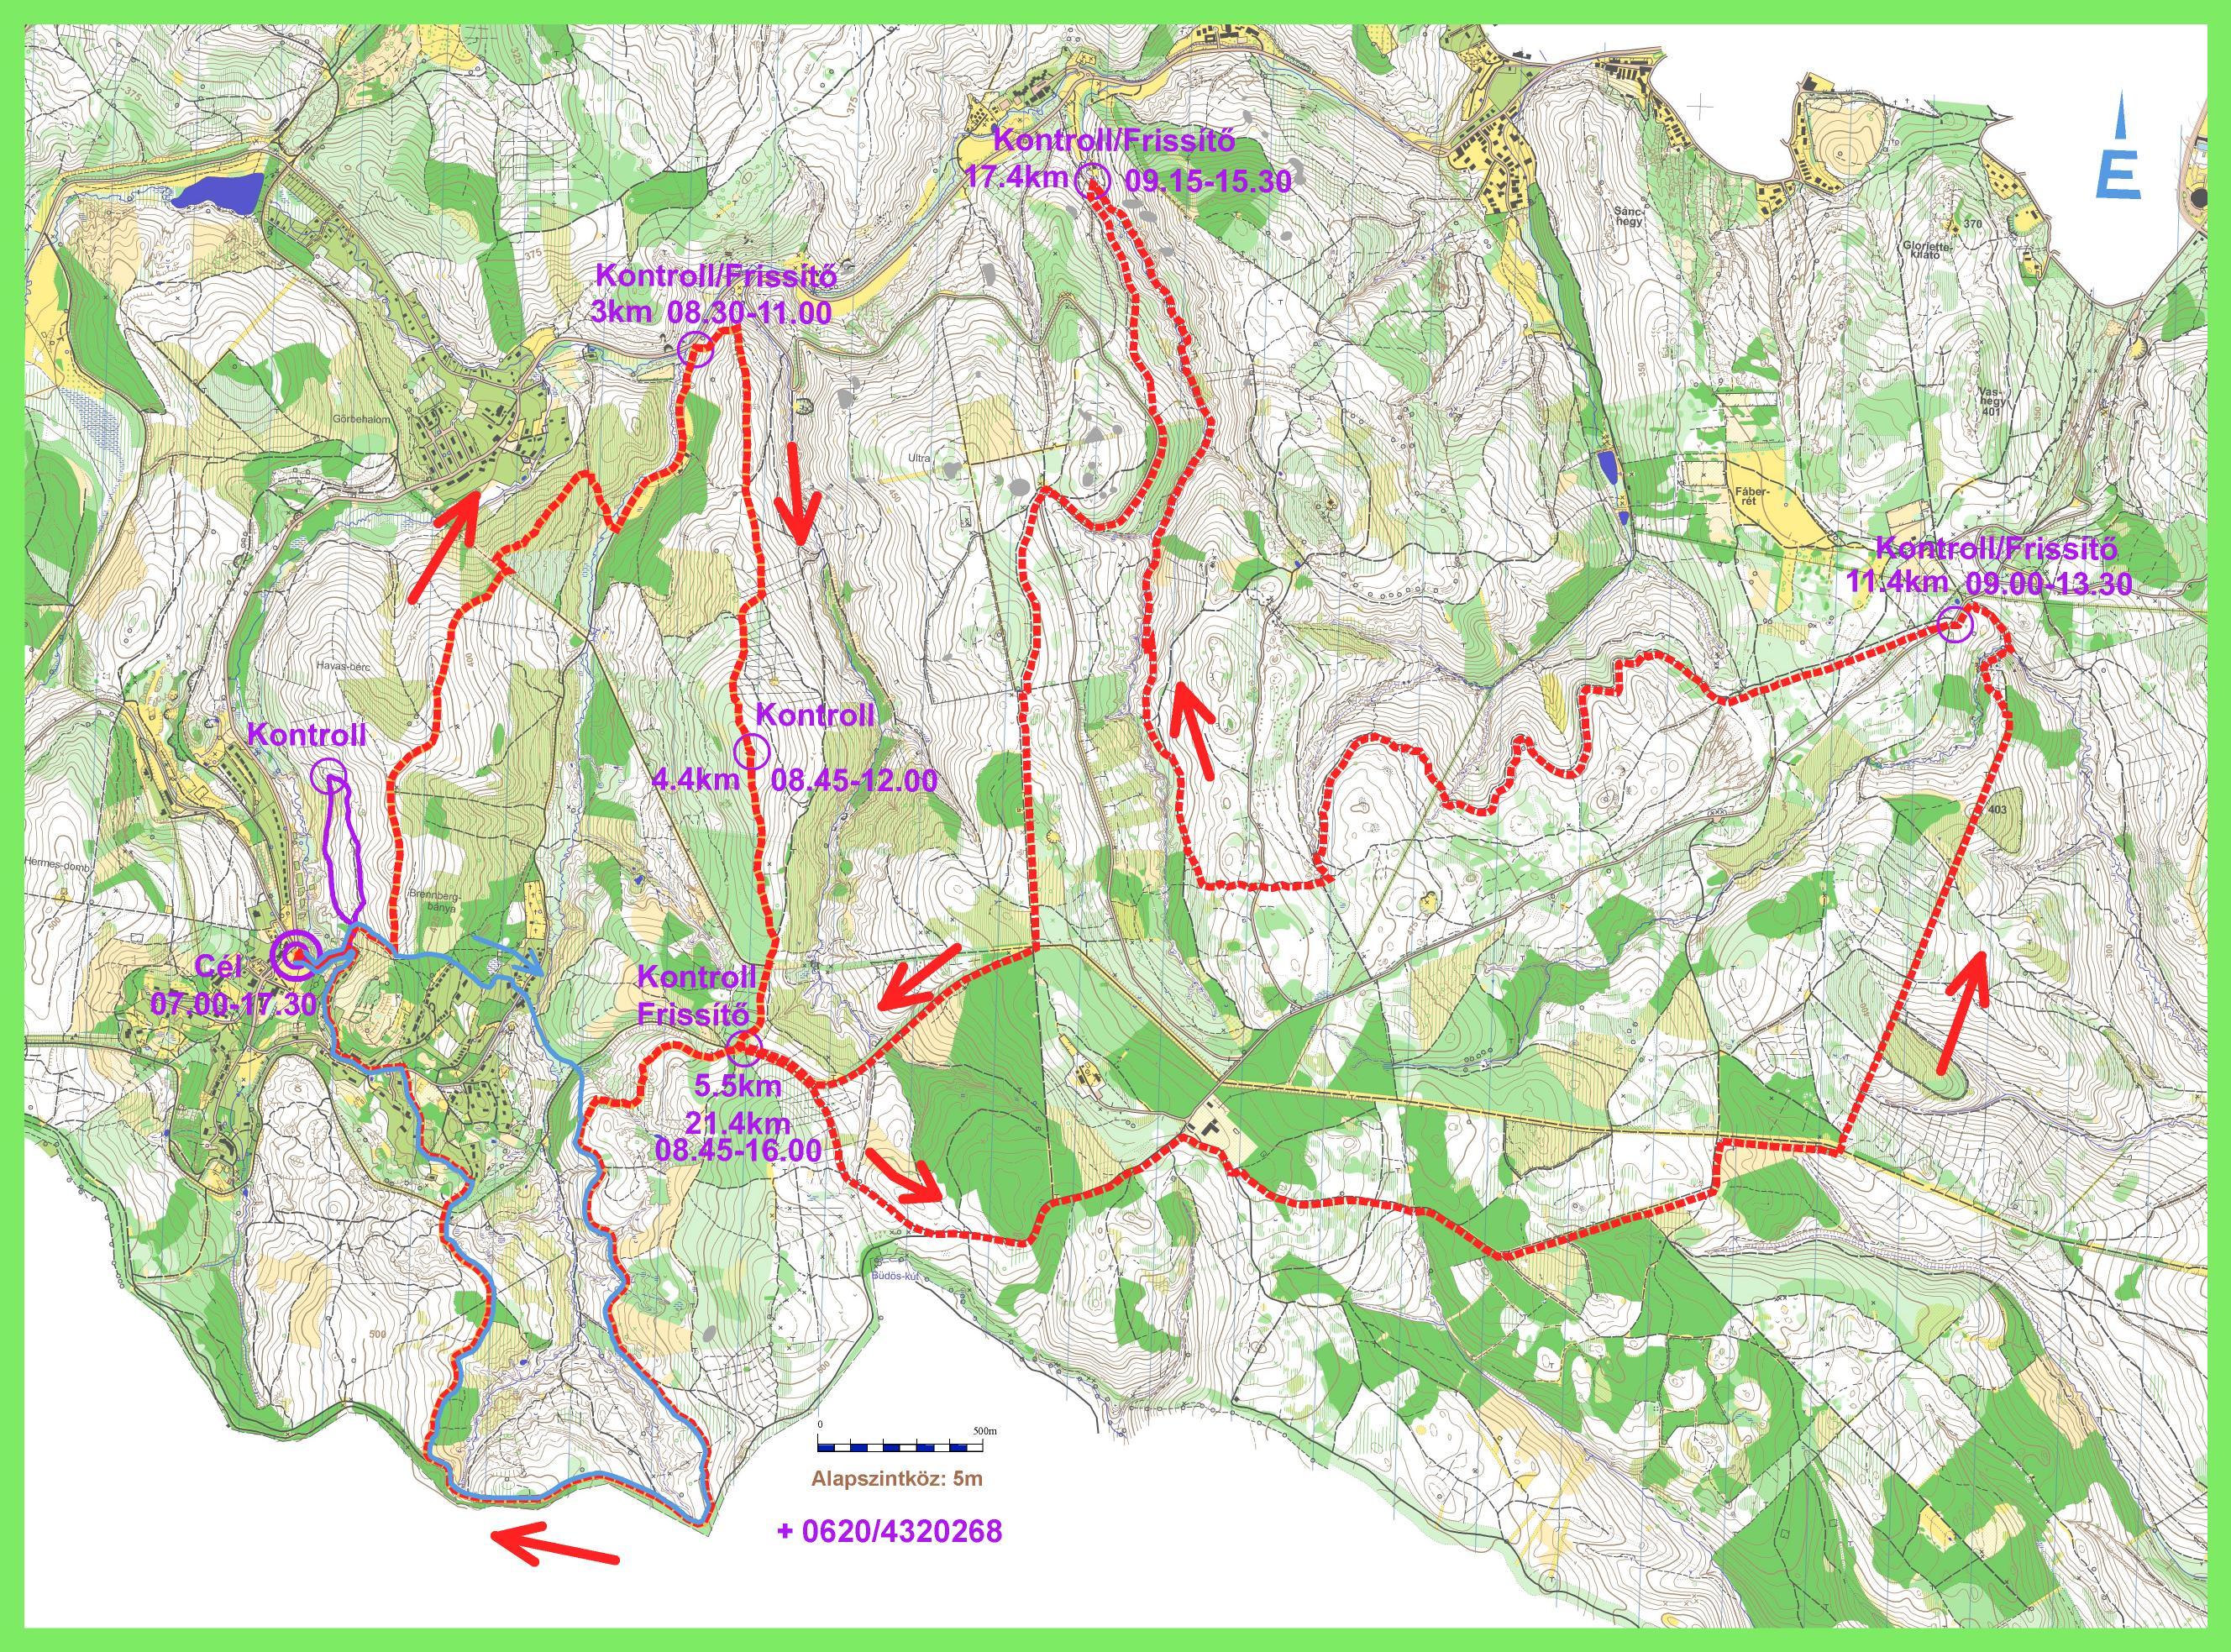 sopron_trail_nyomvonalak_150dpi2.jpg